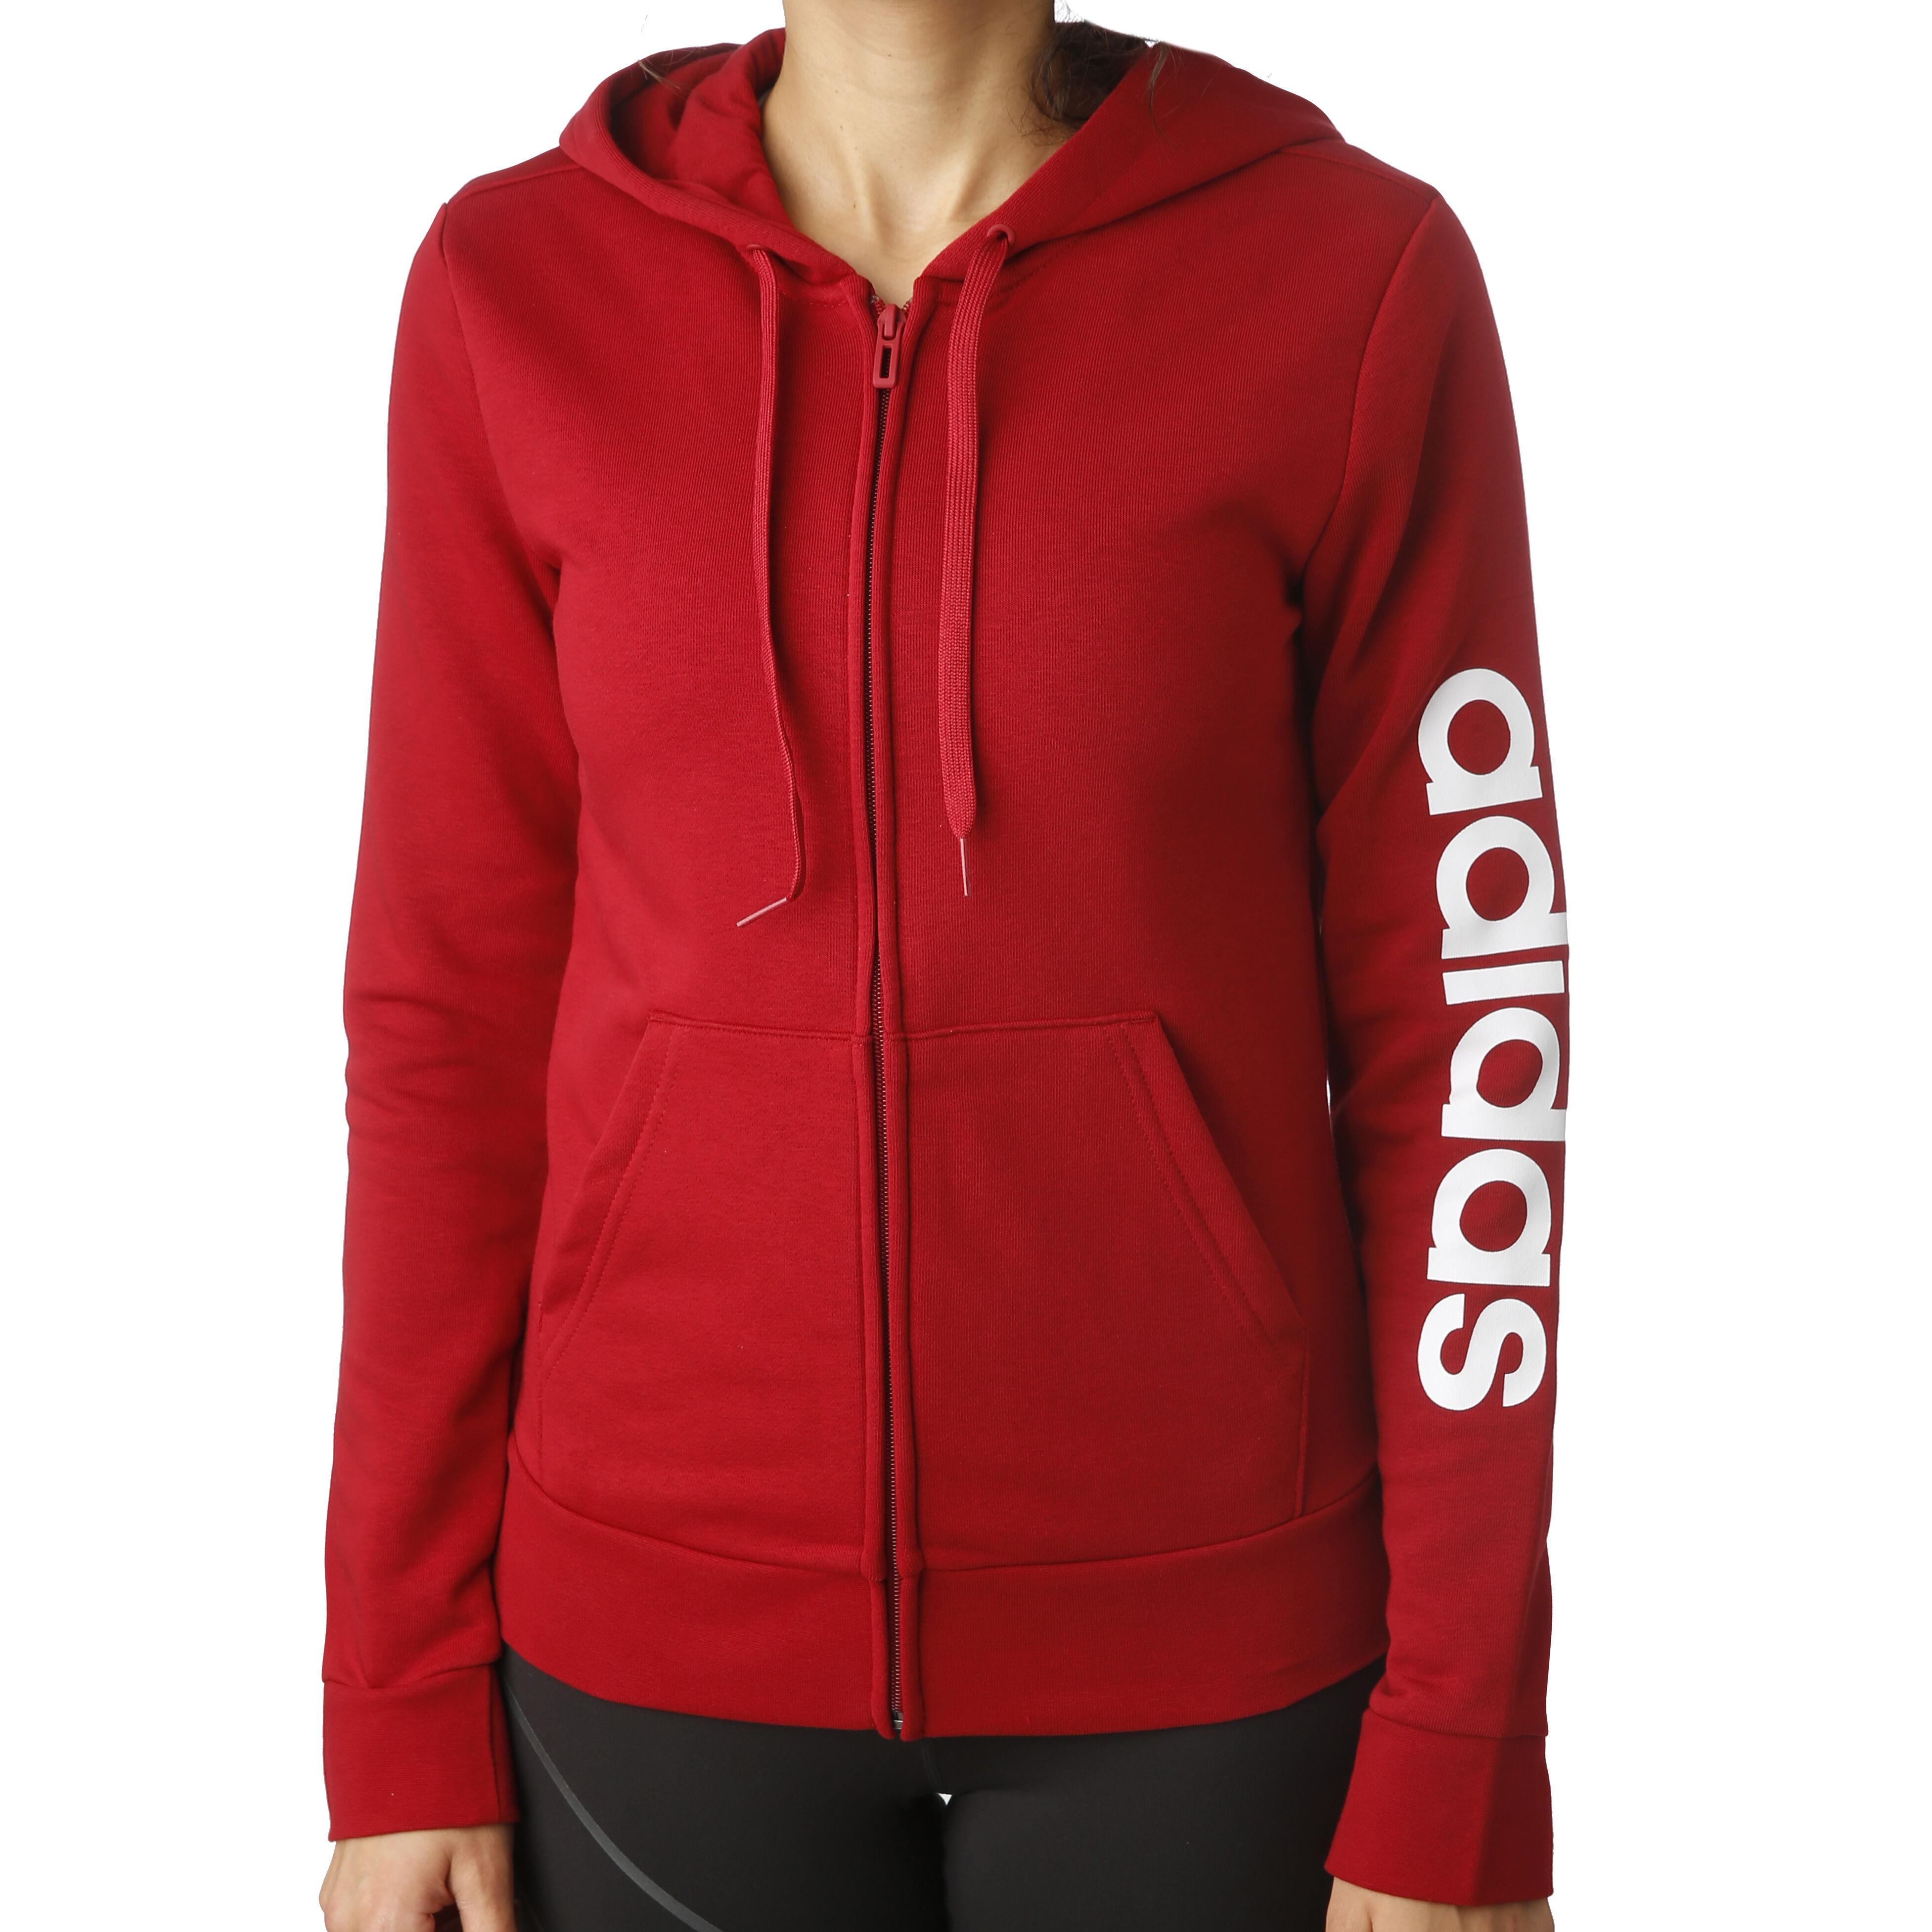 adidas Essentials Linear Sweatjacke Jungen Rot, Weiß